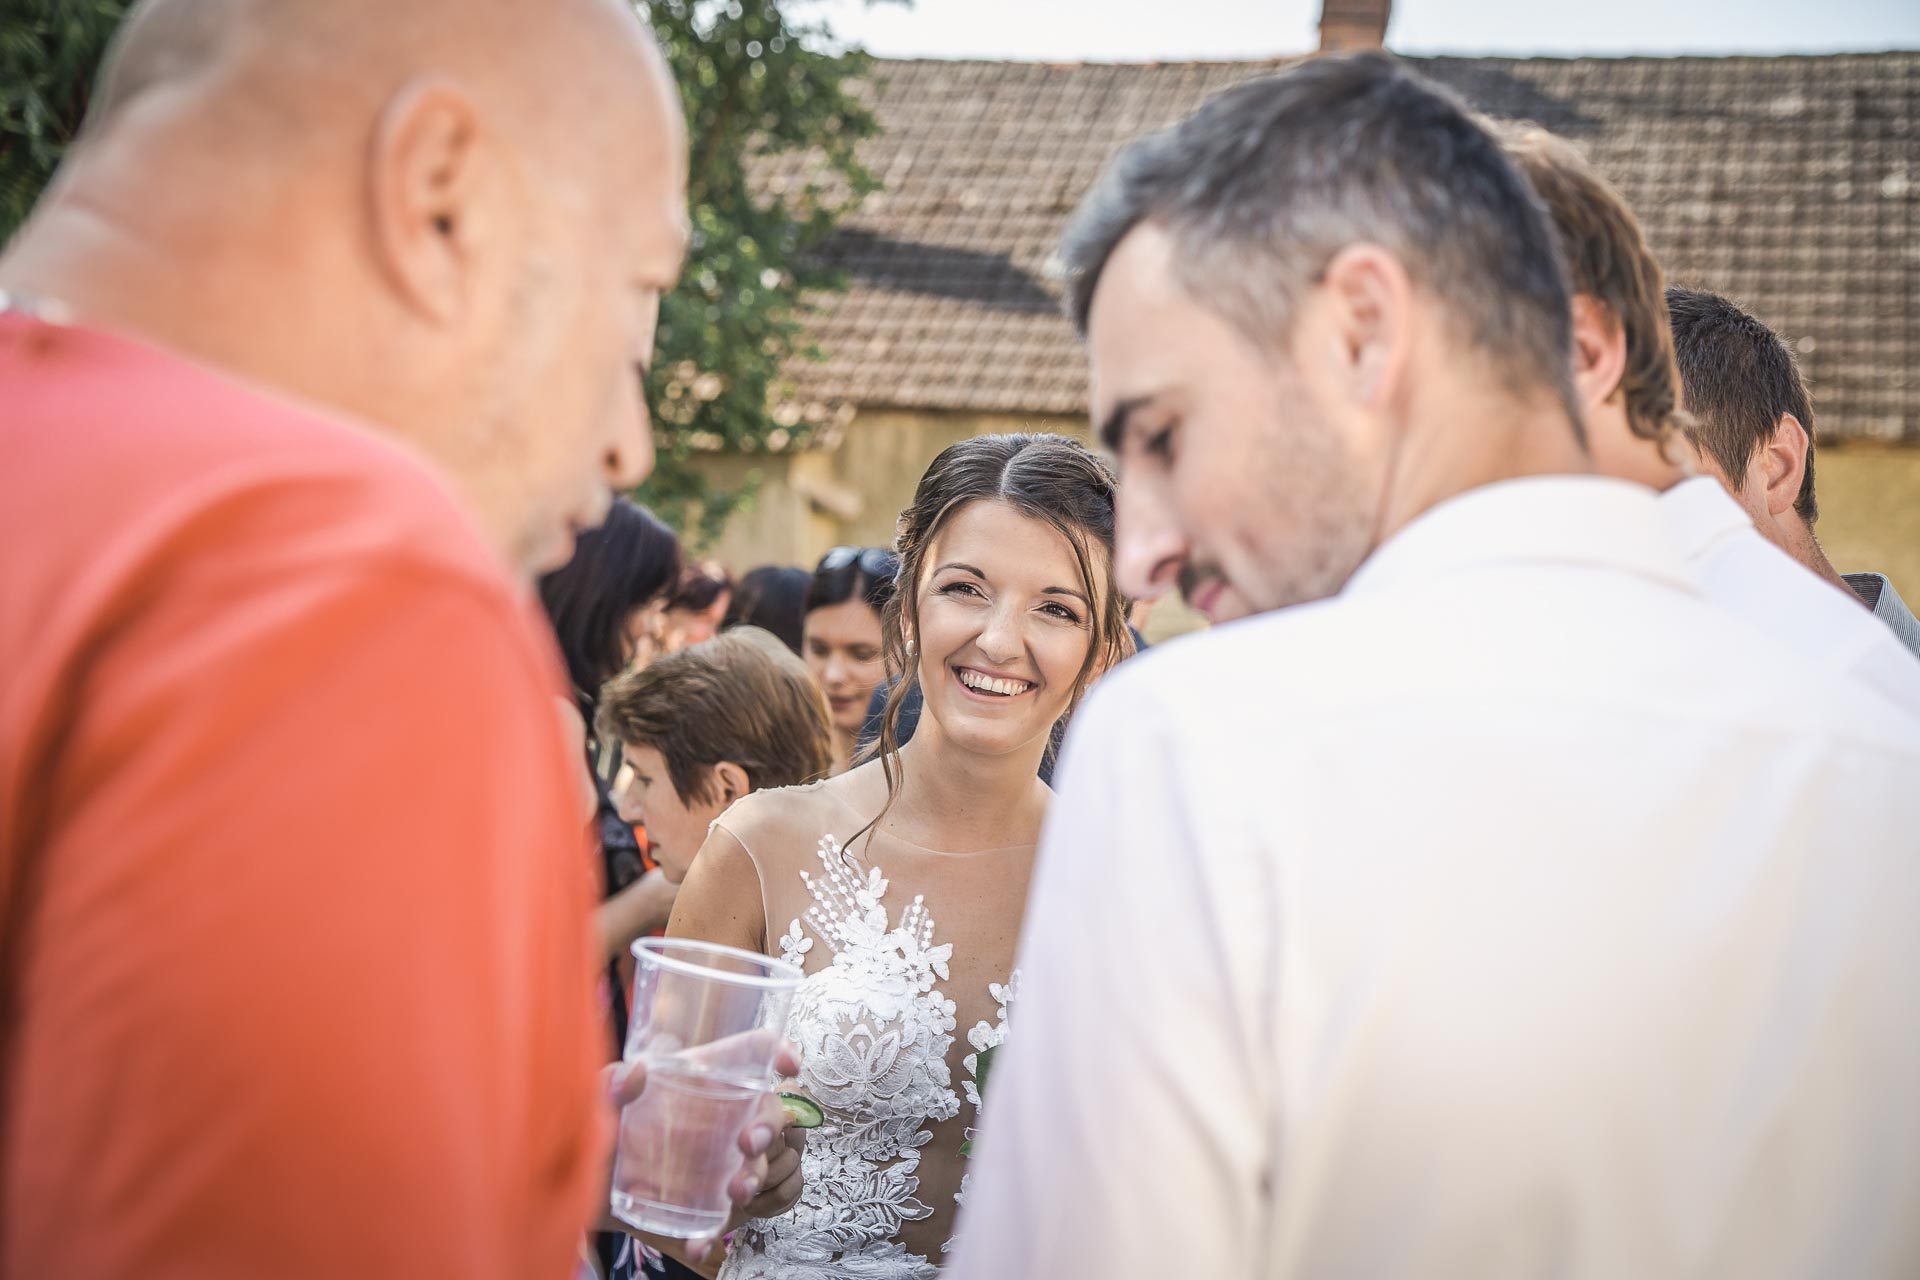 svatební-fotograf-wedding-svatebni-video-orlík-vltava-kostel-statek-stodola-boho-svatba-Beautyfoto-142